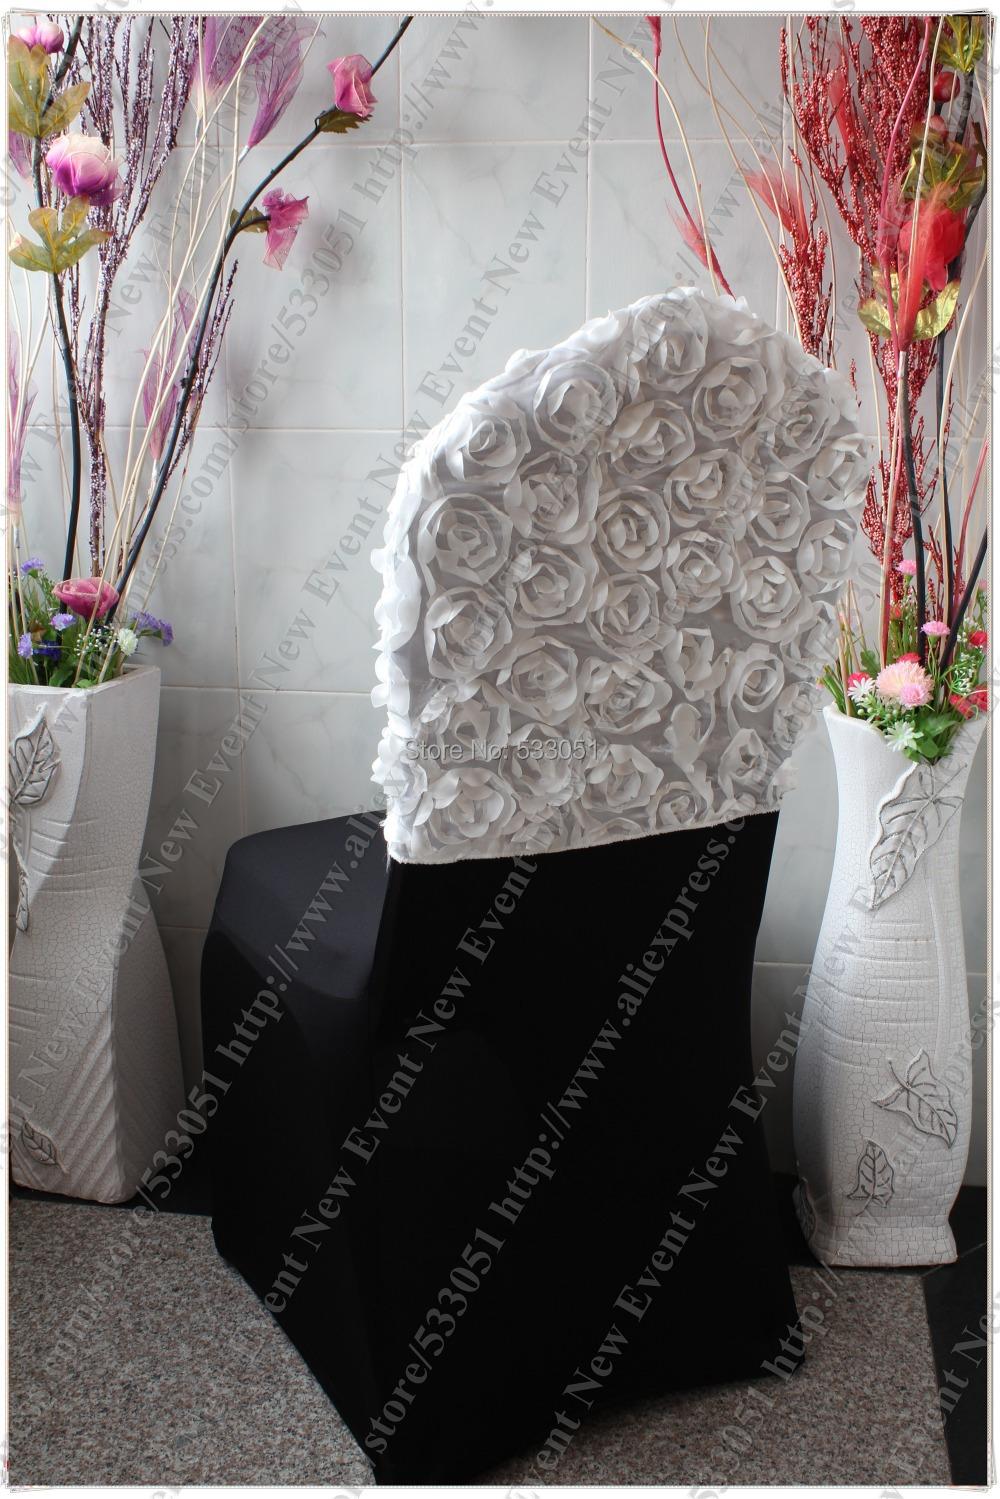 Popular Rosette Chair Covers Buy Cheap Rosette Chair